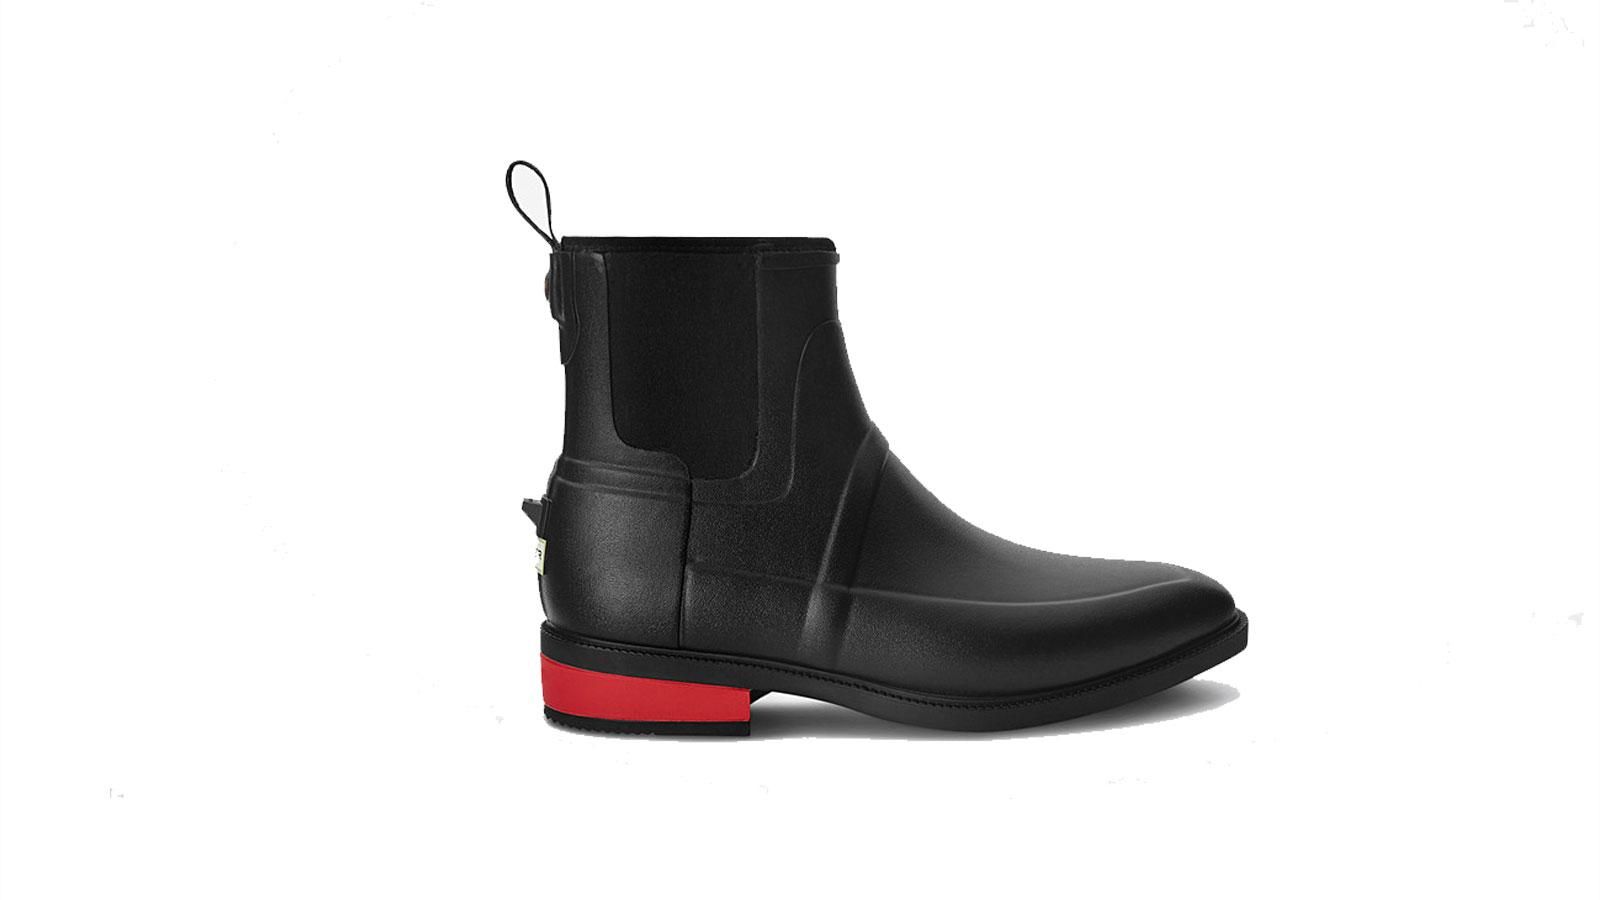 Wellesley Rubber Jodhpur Men's Waterproof Boot by Hunter   the best men's waterproof boots